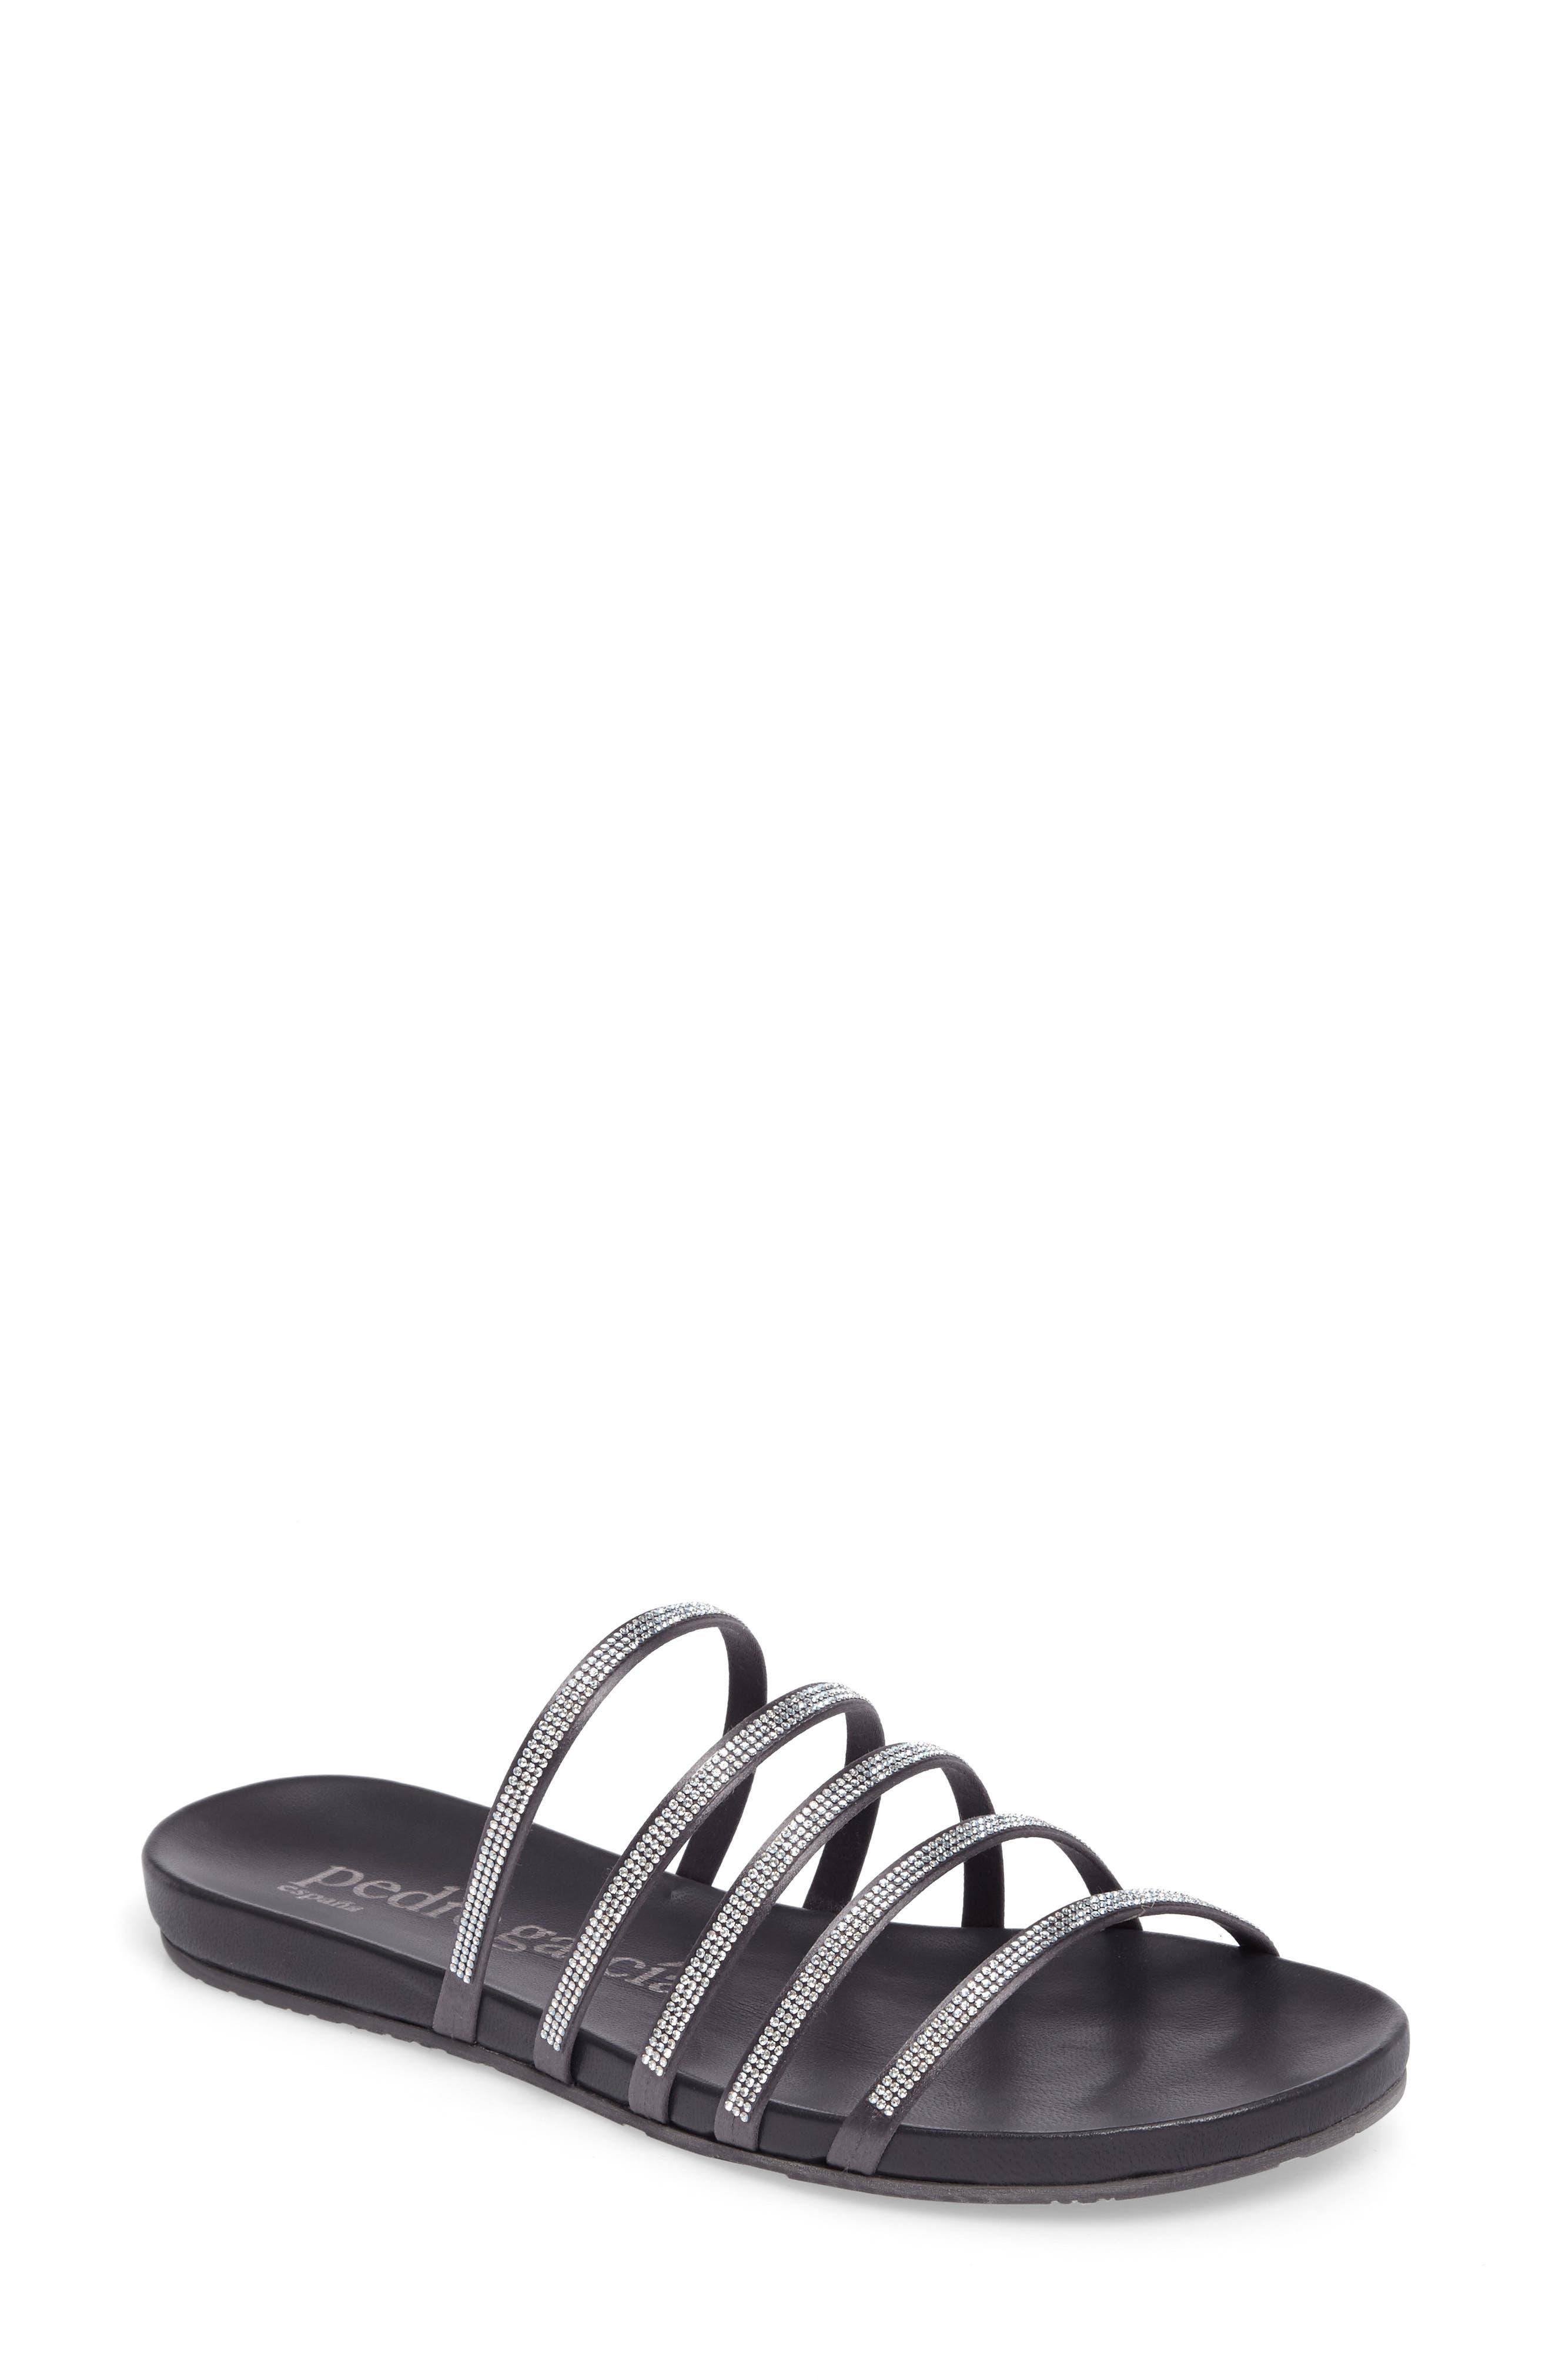 Gala Slide Sandal,                         Main,                         color, Fox Satin